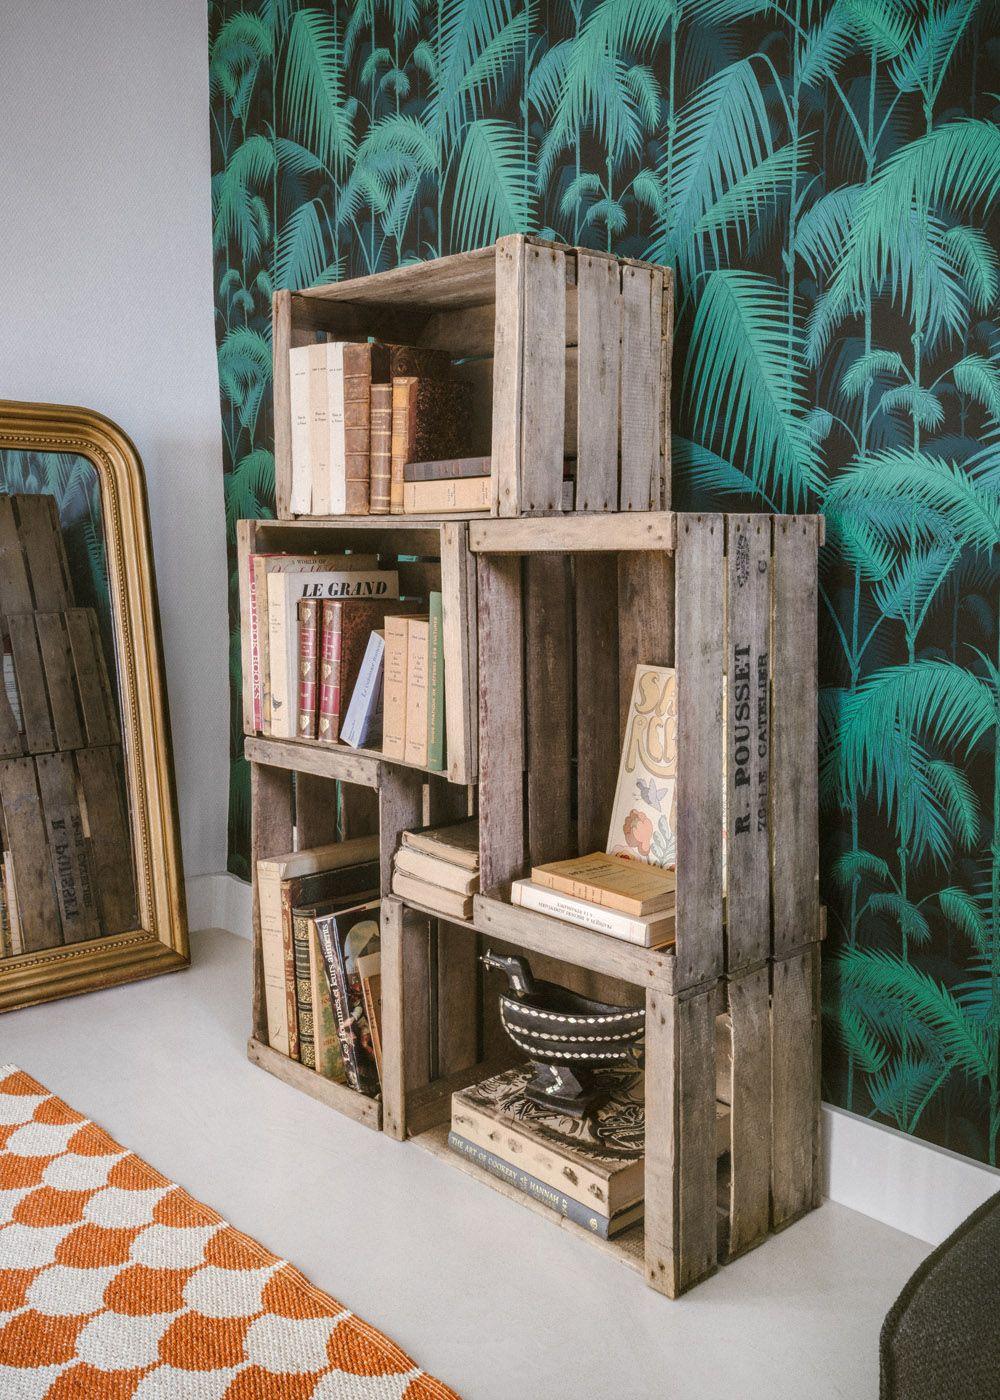 Home Rangement Caisses A Pommes Wooden Crate Wallpaper Palm